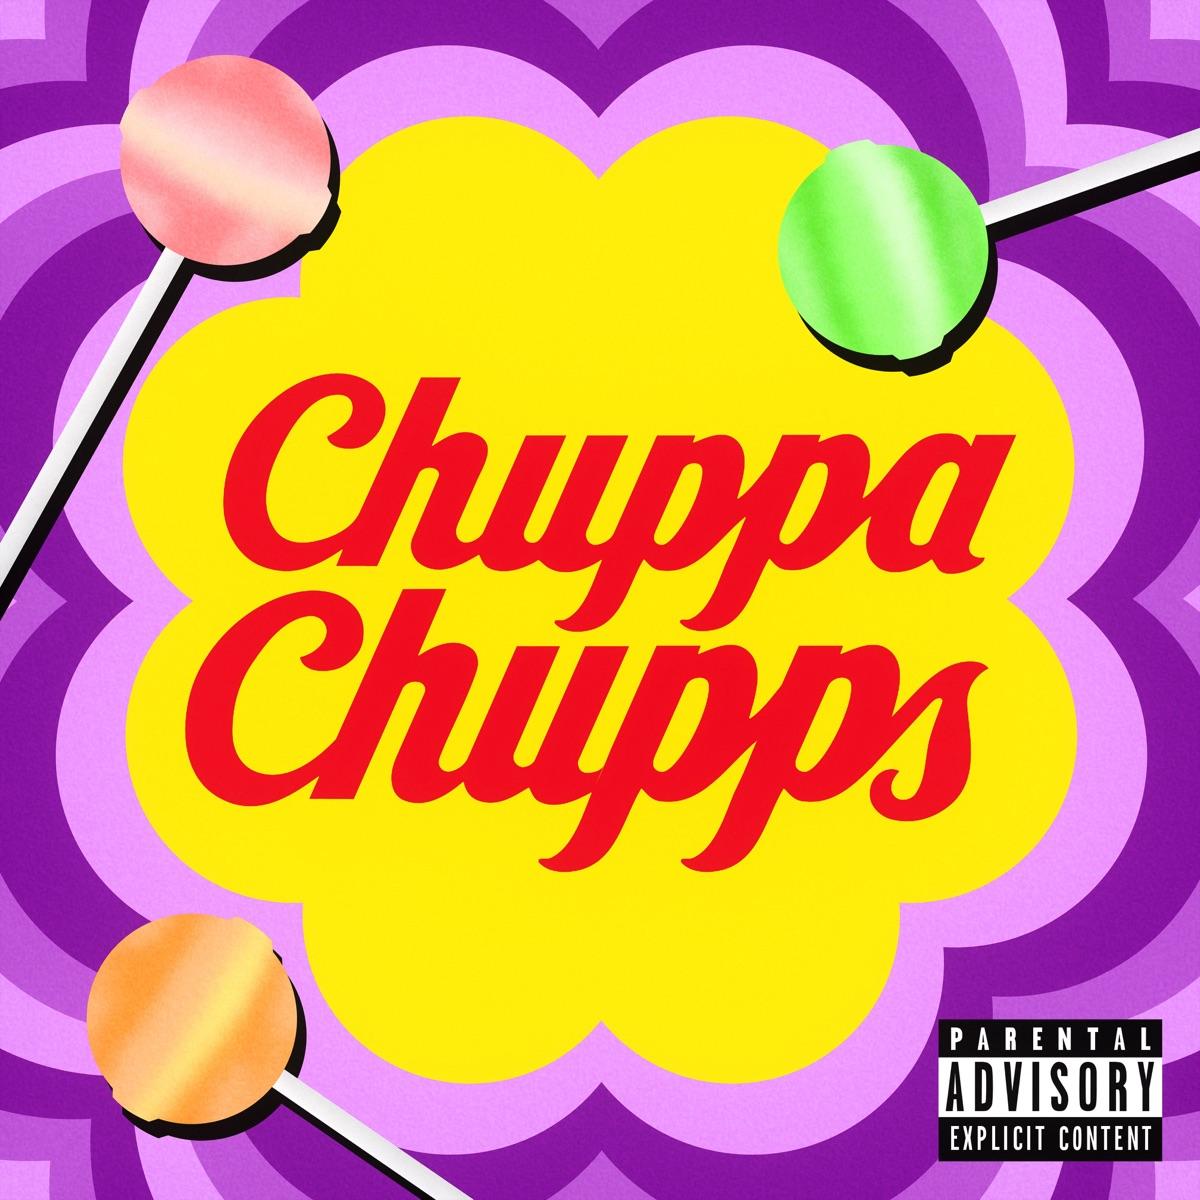 『CREAM - Chuppa Chupps』収録の『Chuppa Chupps』ジャケット